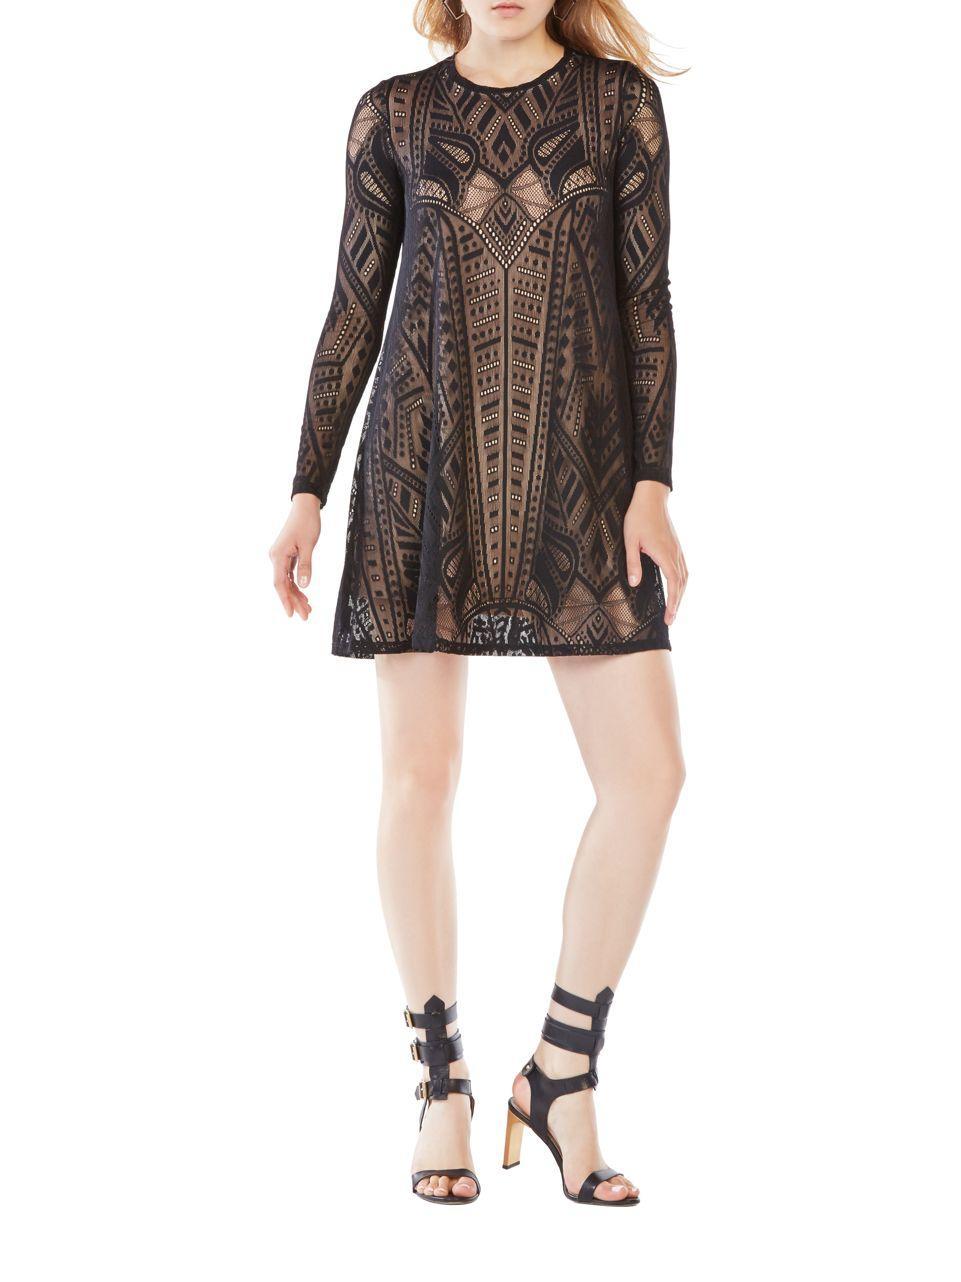 551ca6ab21 Bcbgmaxazria Long Sleeve Burnout Dress in Black - Lyst